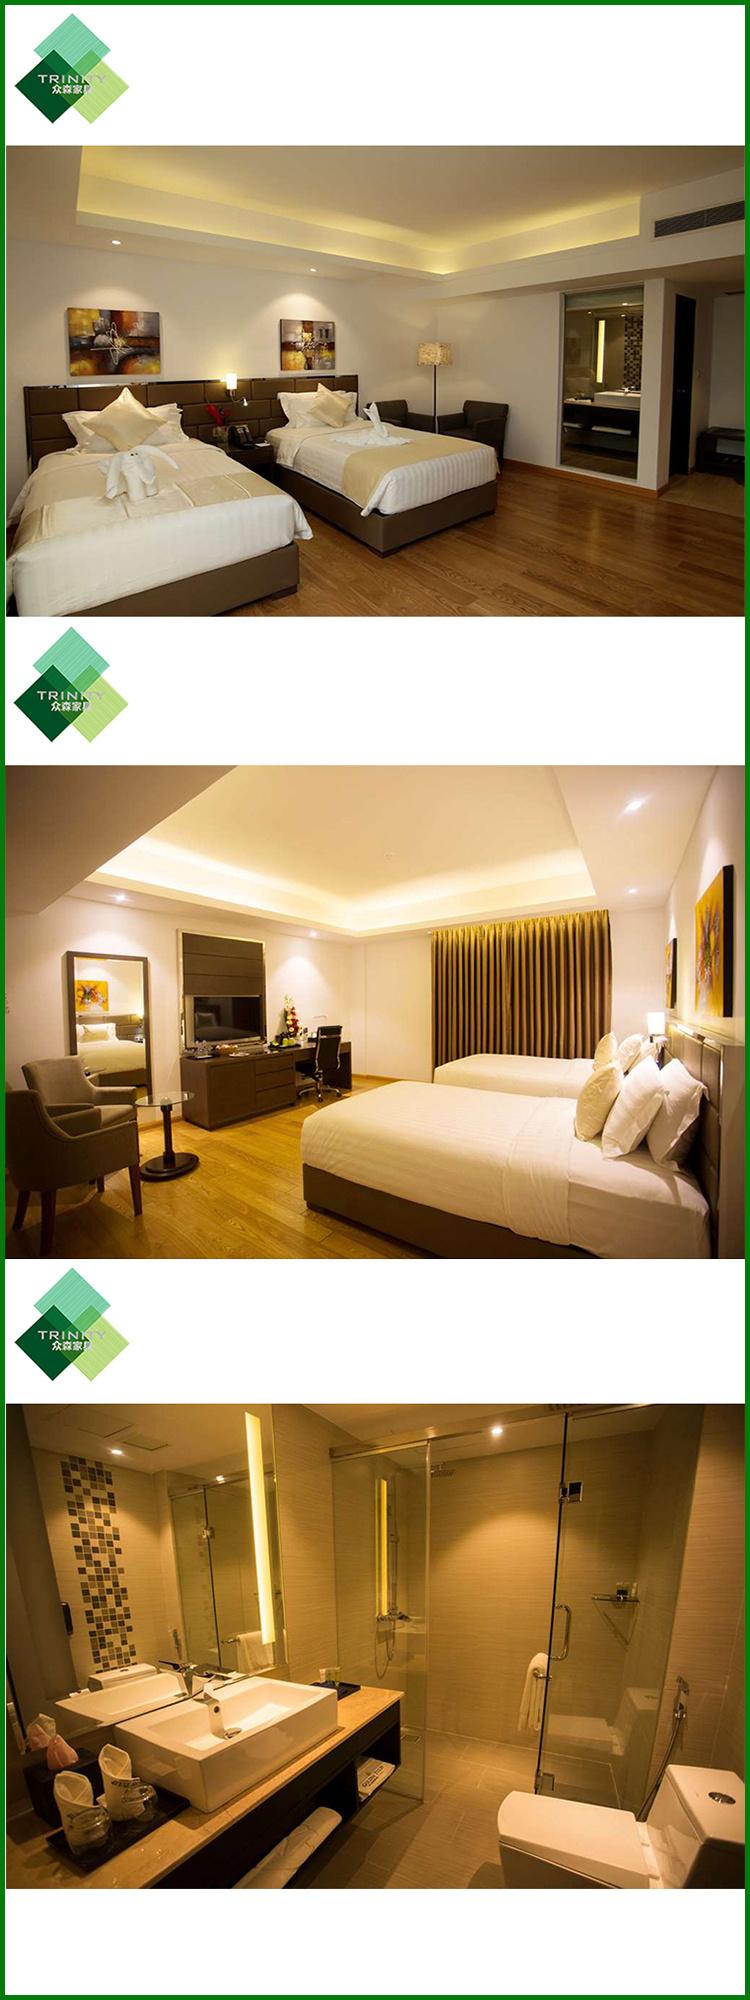 5 Etoiles Luxe Integral Solide Hotel Design De Mobilier Moderne En